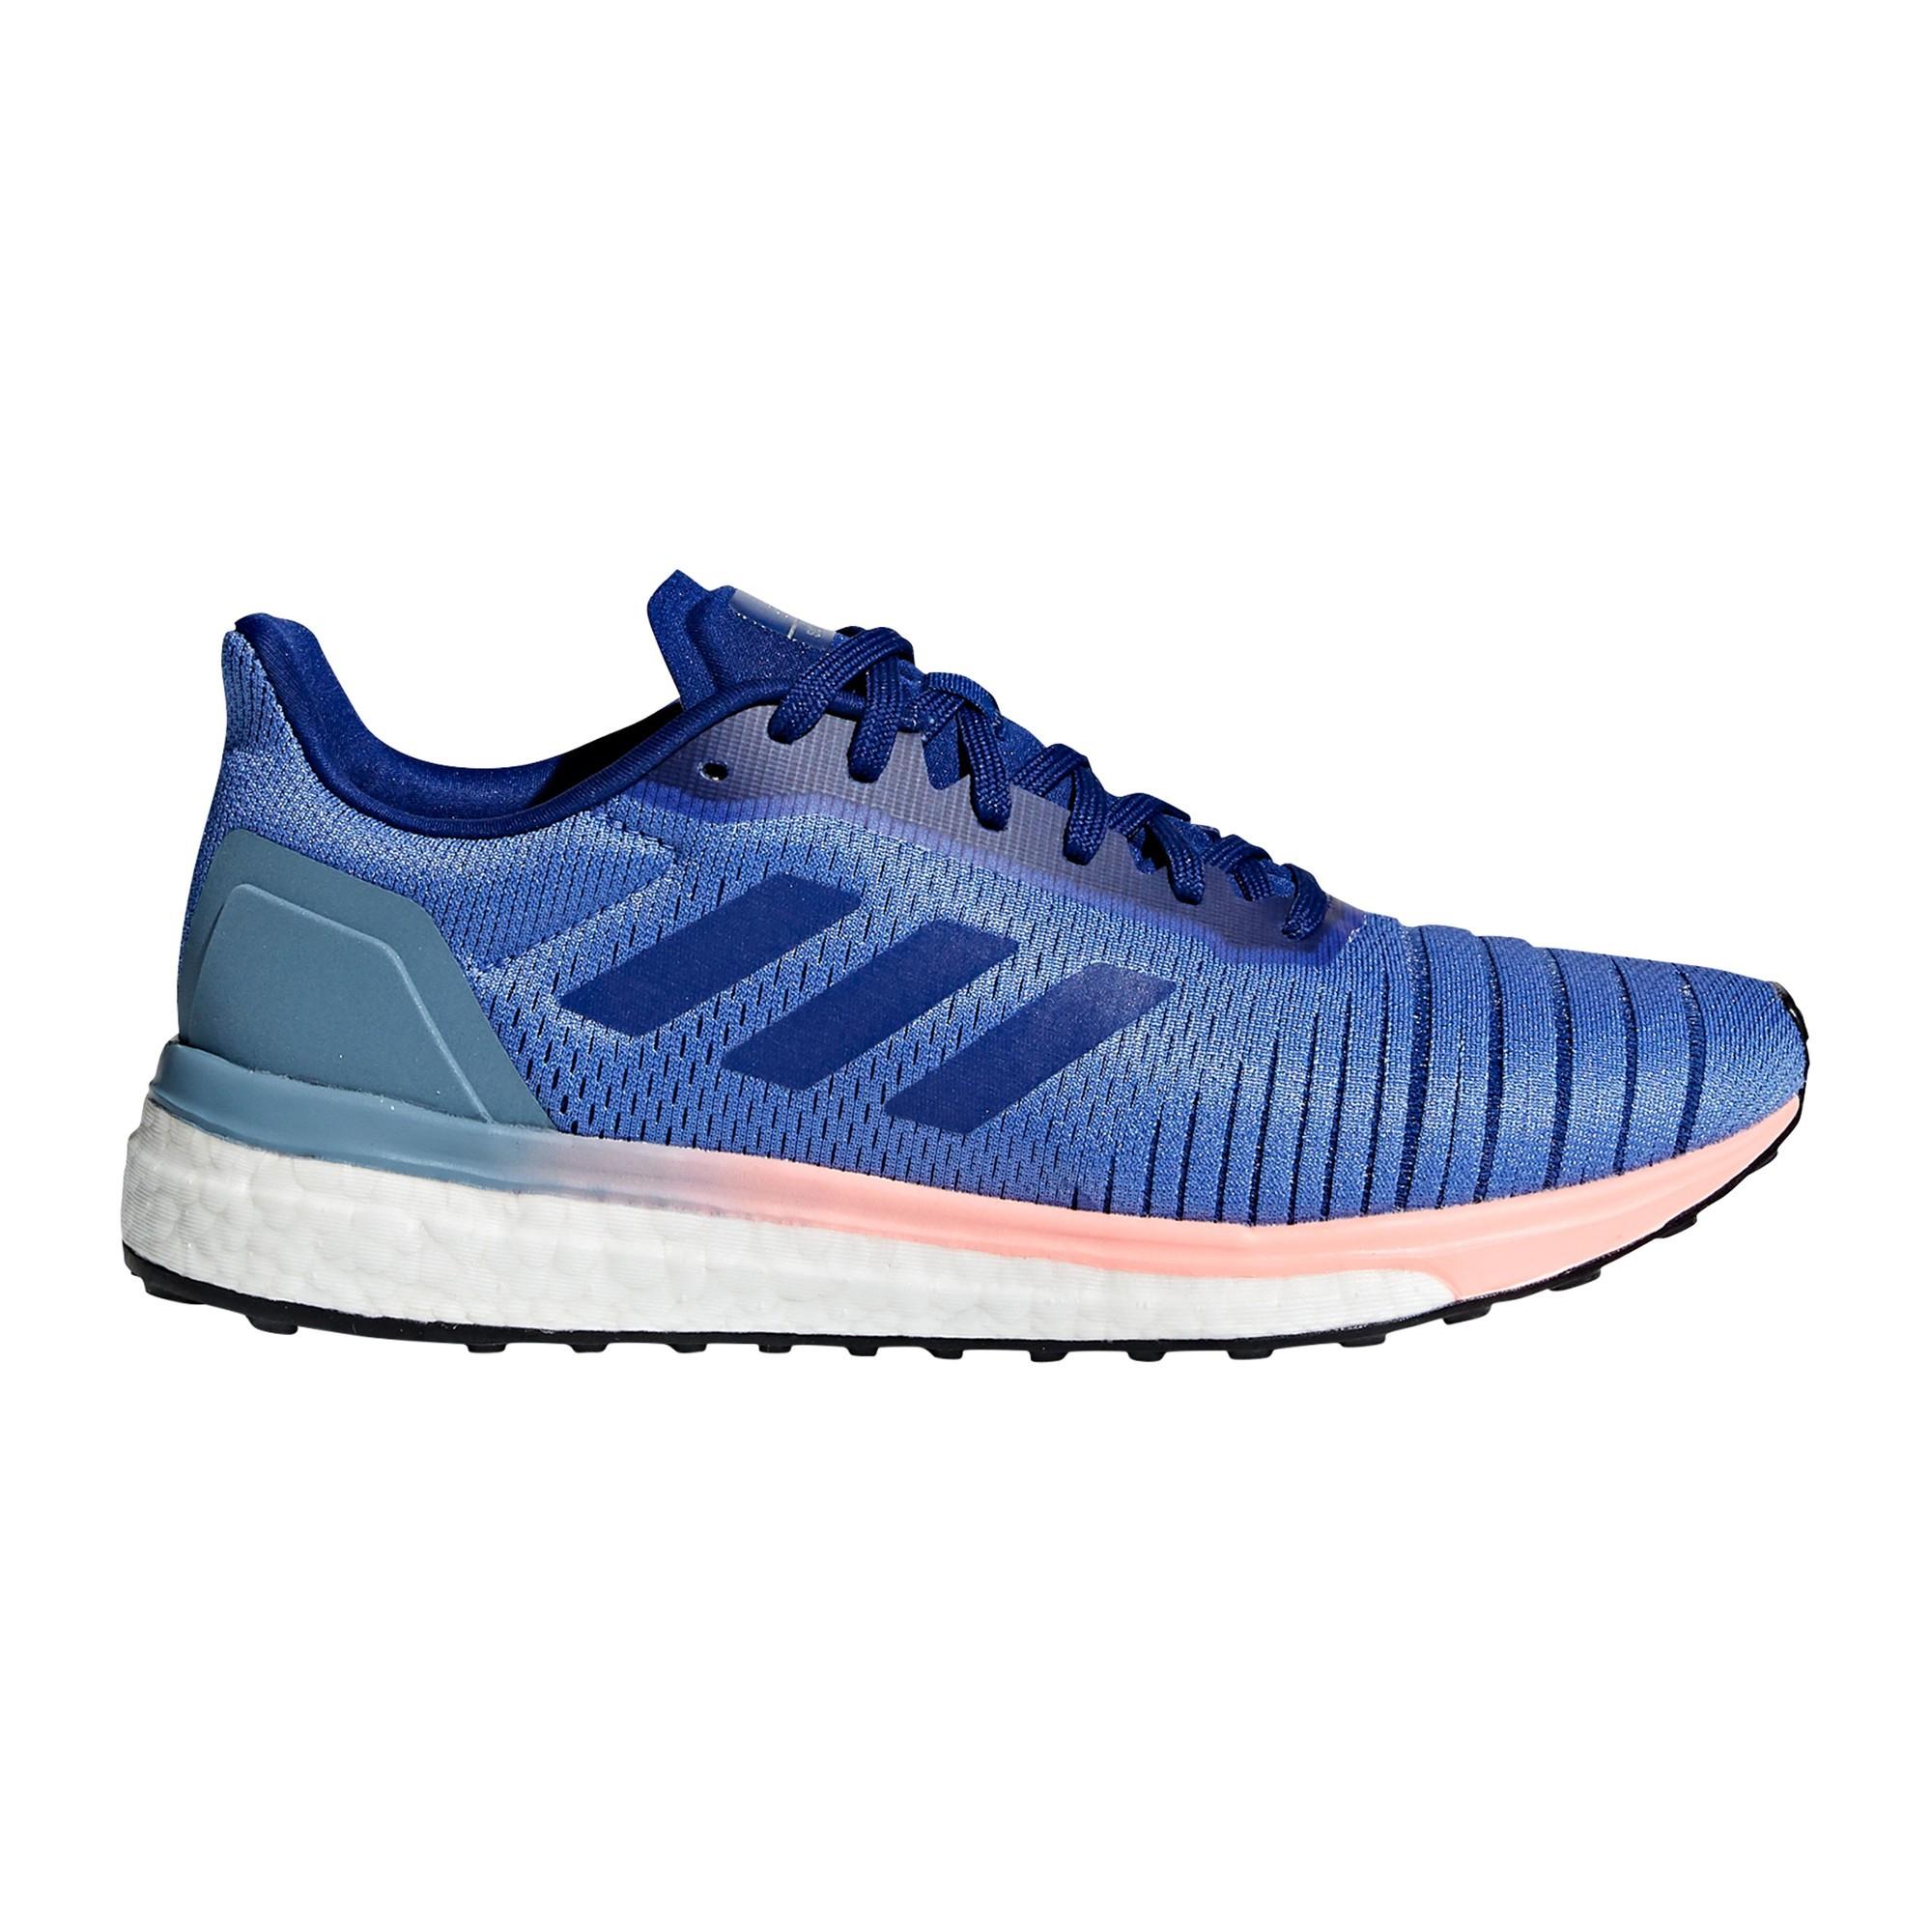 Afbeelding van Adidas Solar Drive AC8139 Hardloopschoenen Dames Real Lilac